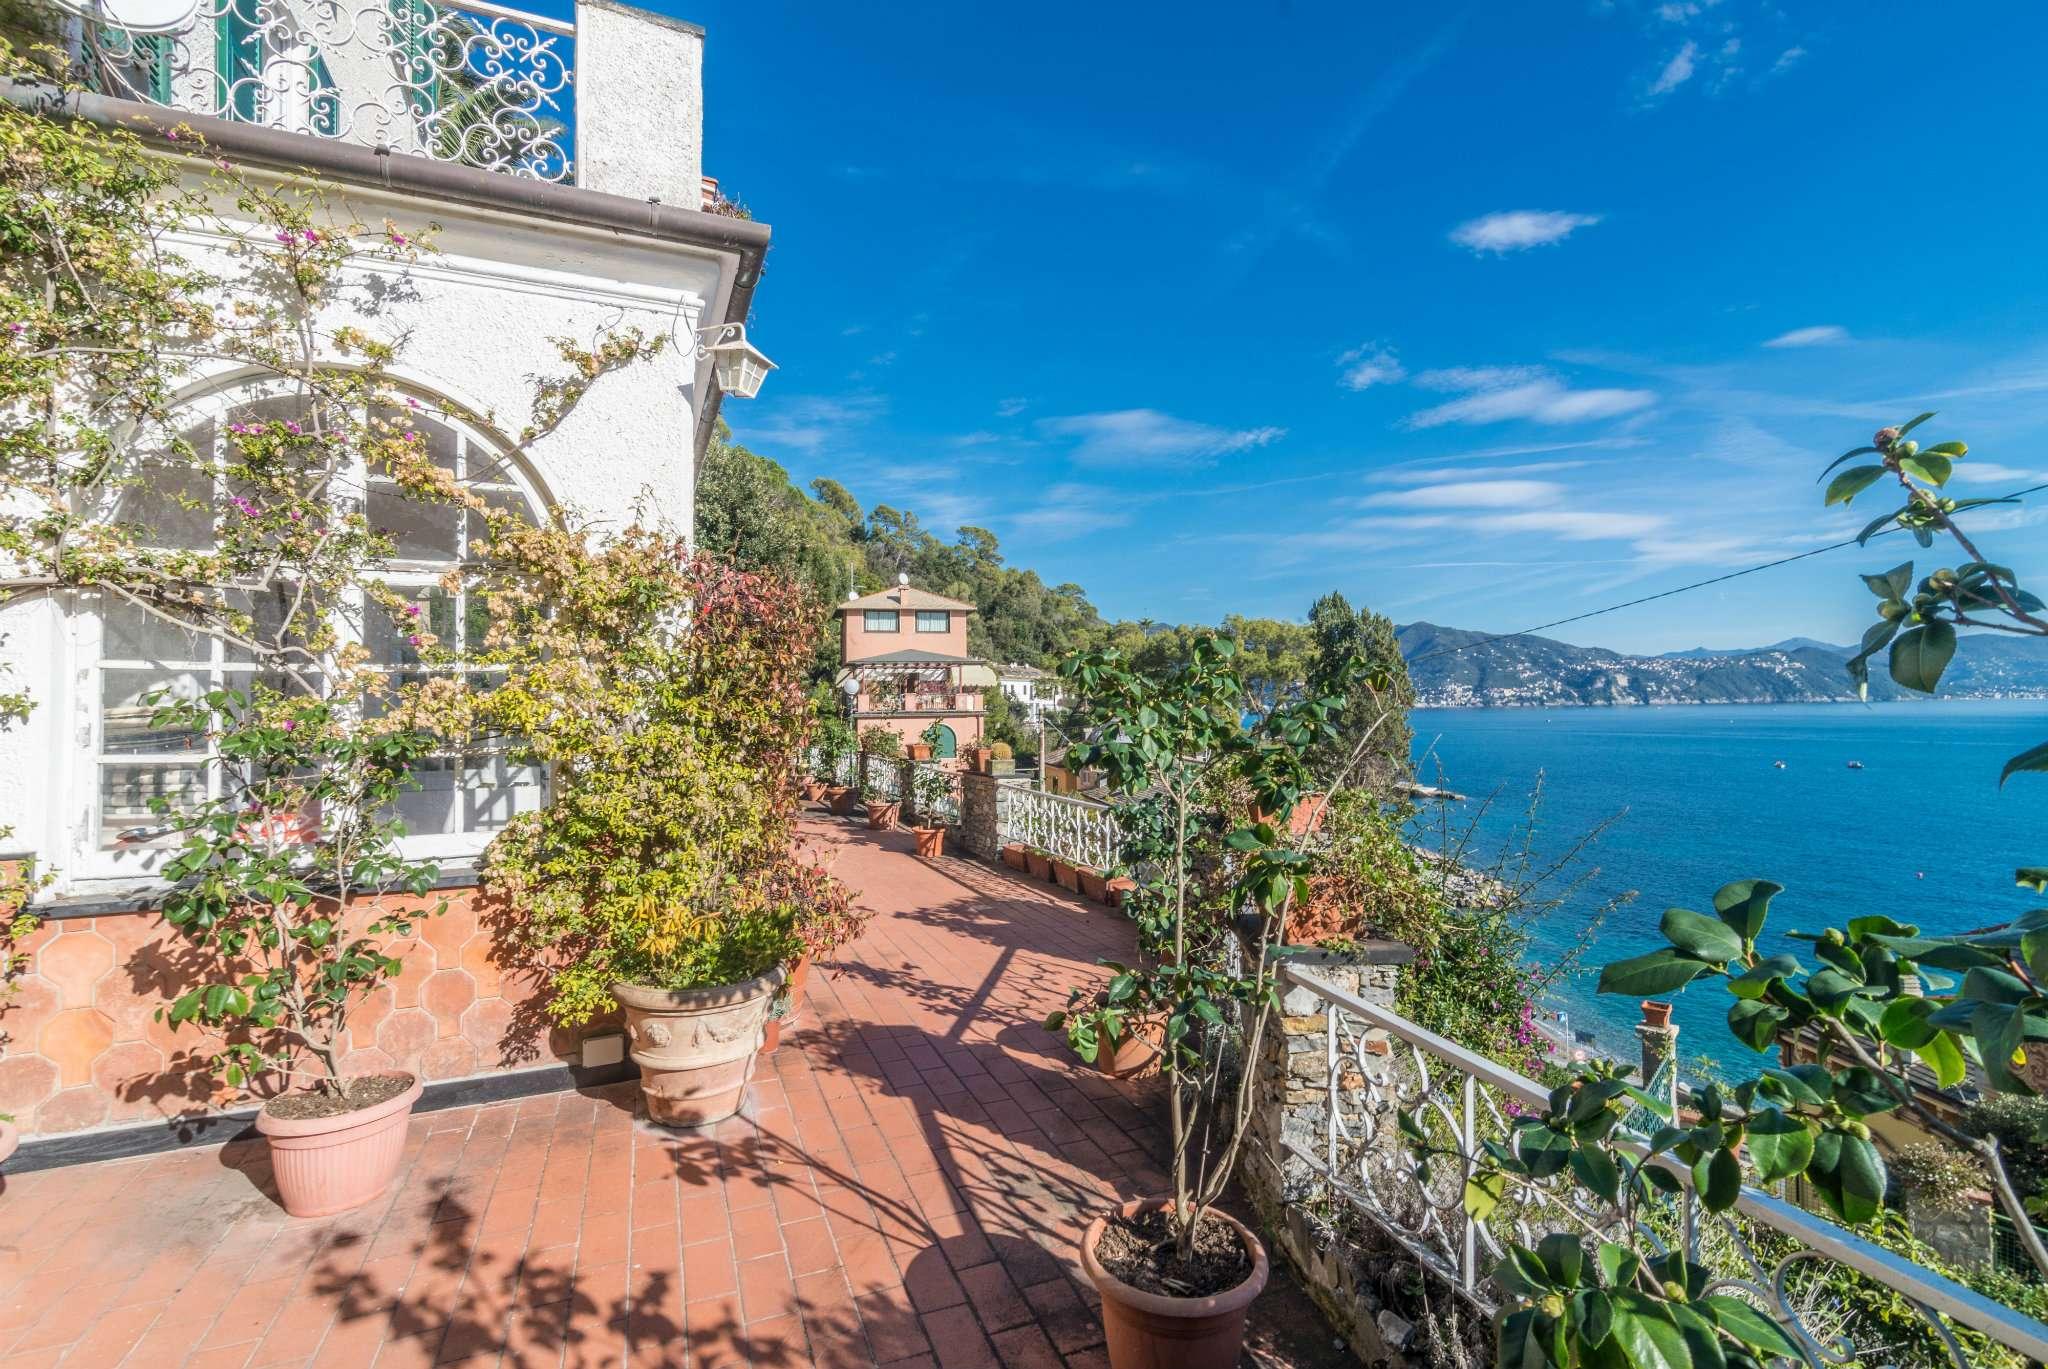 Villa in Vendita a Santa Margherita Ligure: 5 locali, 545 mq - Foto 17